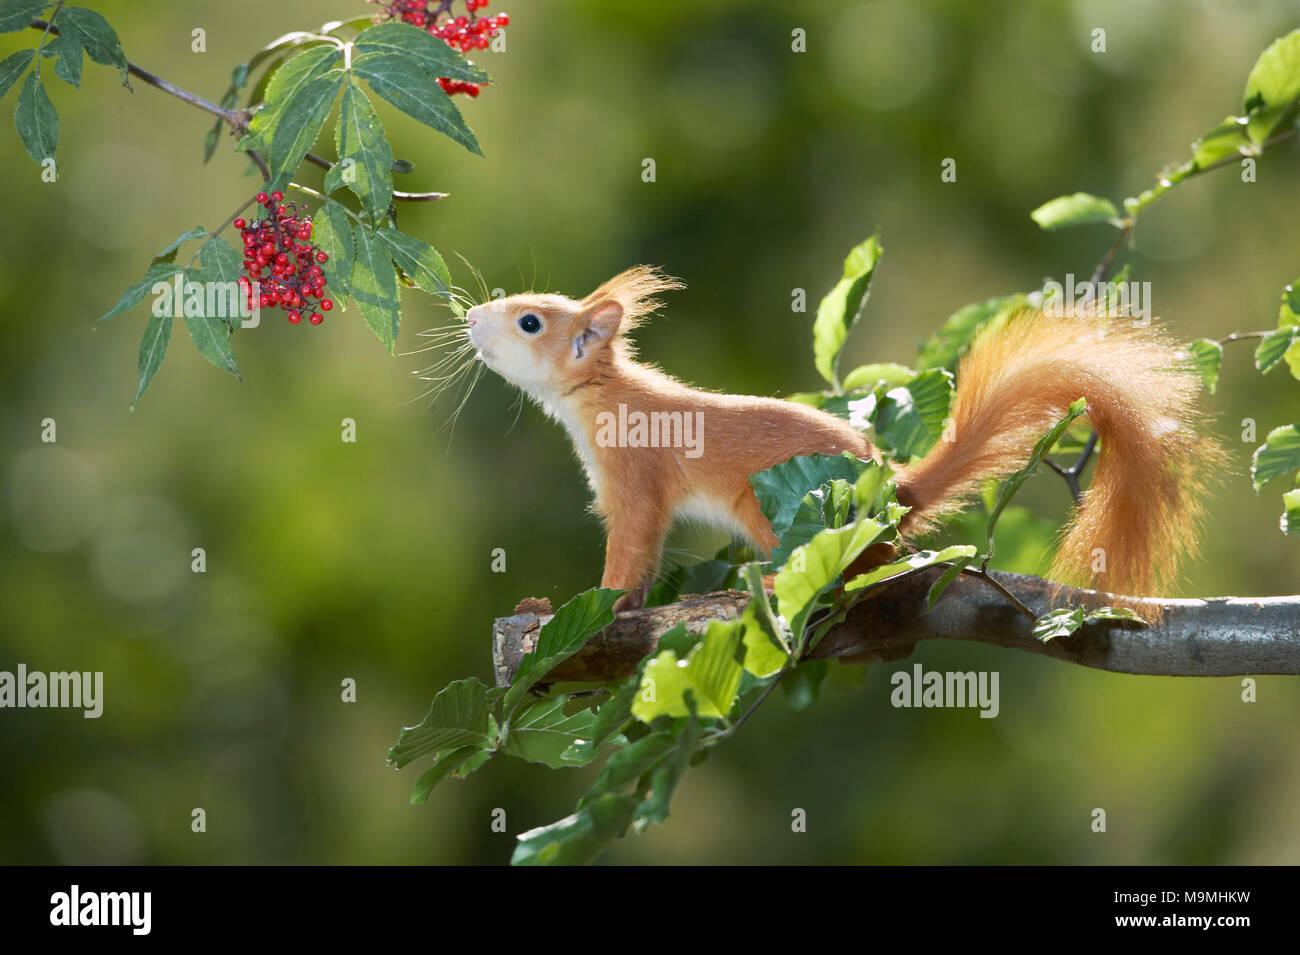 European Red Squirrel (Sciurus vulgaris) stretching for red berries. Germany - Stock Image